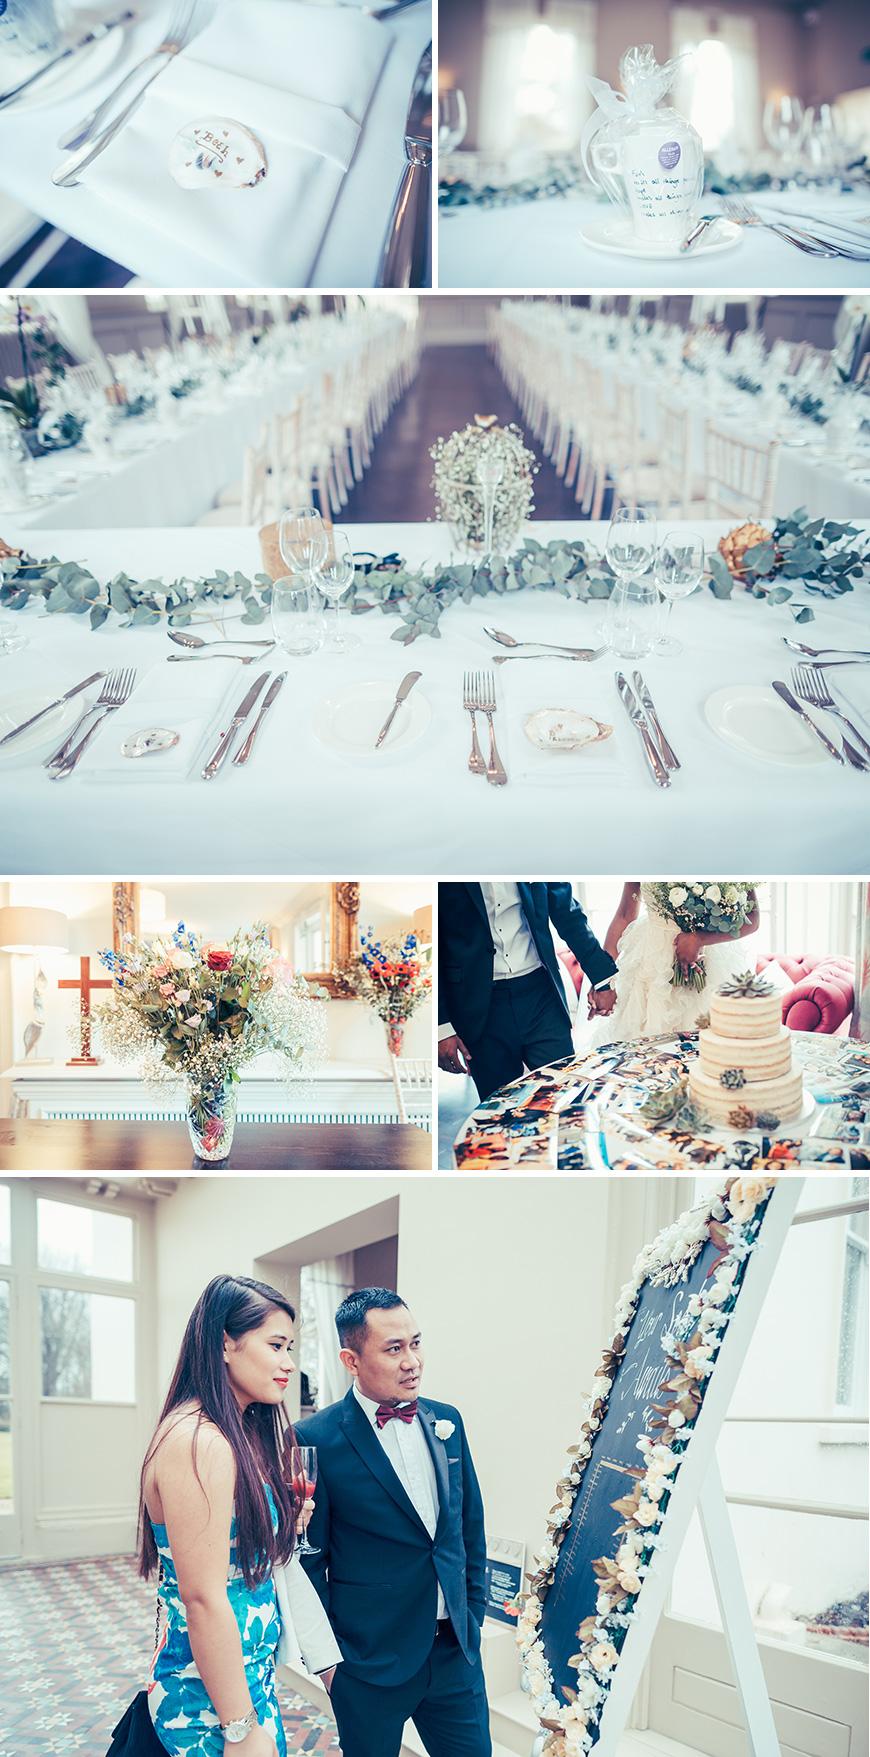 Angela and Praj's Handmade Wedding in London - DIY | CHWV